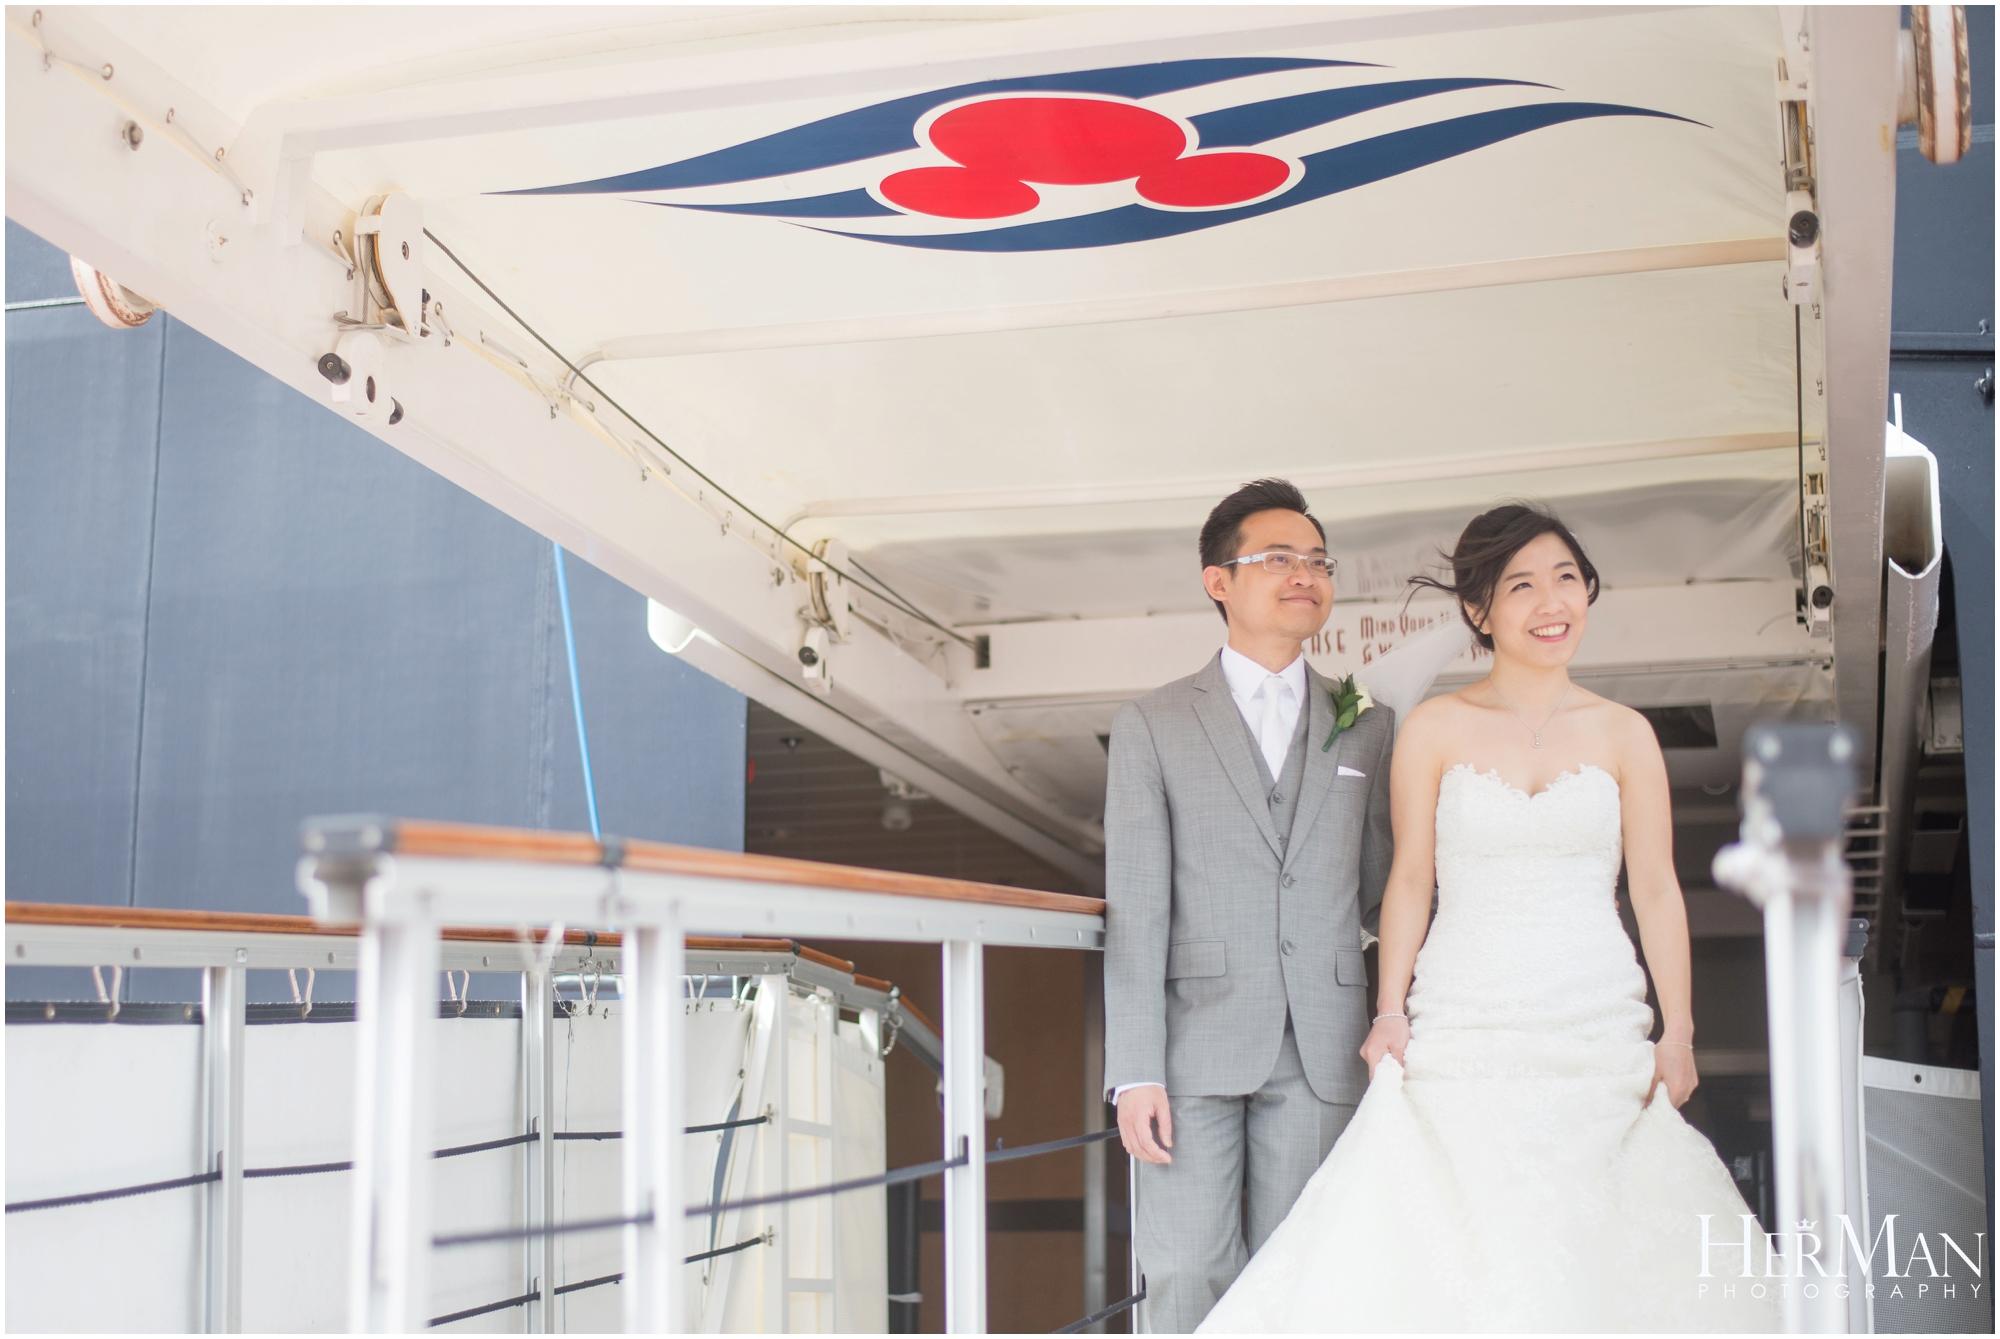 disney-fantasy-cruise-wedding-HerMan-photography_0040.jpg